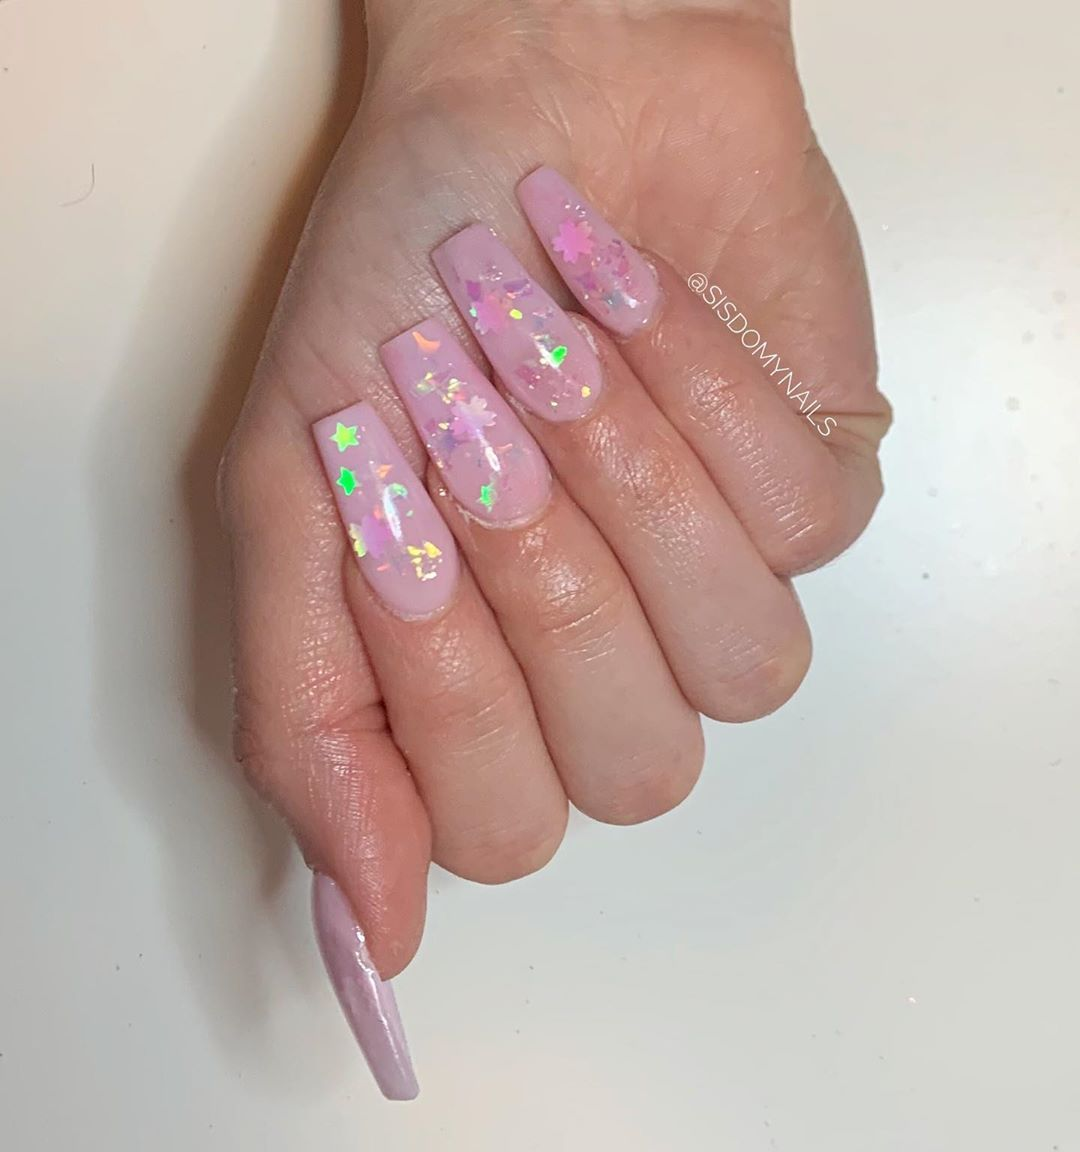 Sis Beauty Studio On Instagram Sisdomynails Nails Acrylicnails Sculptednails Pinknails Denvernails Denver In 2020 Beauty Studio Instagram Beauty